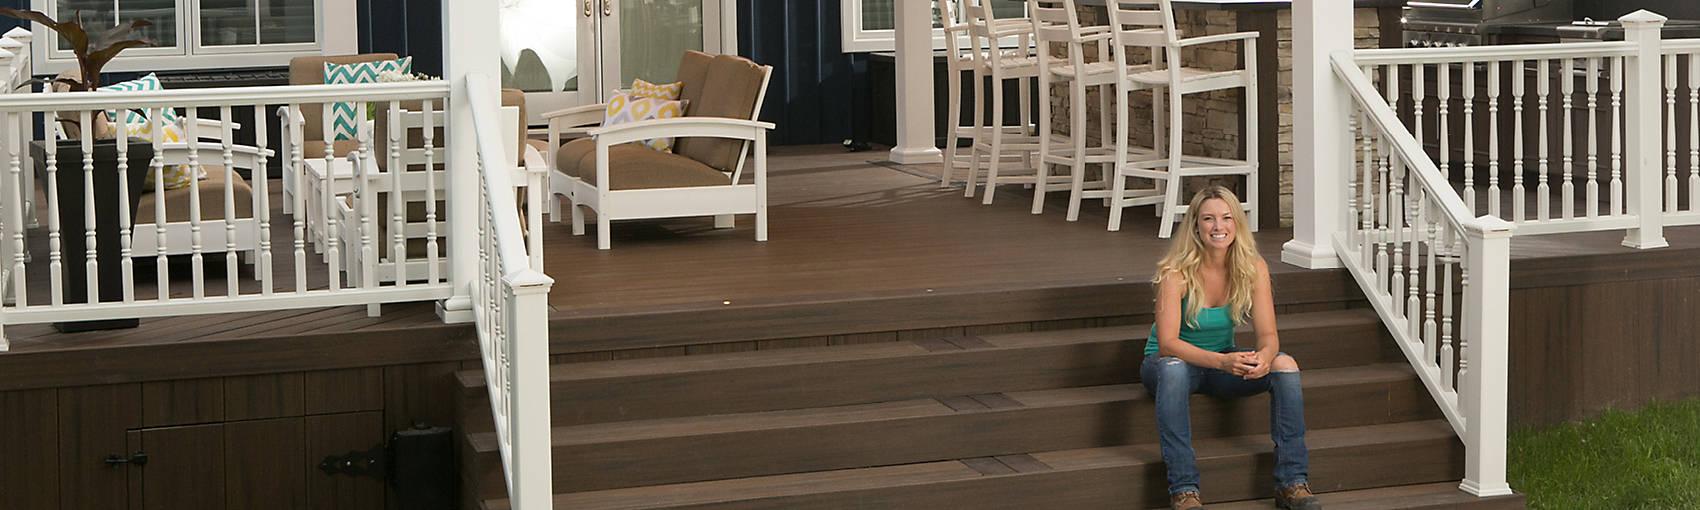 composite decking composite deck materials trex